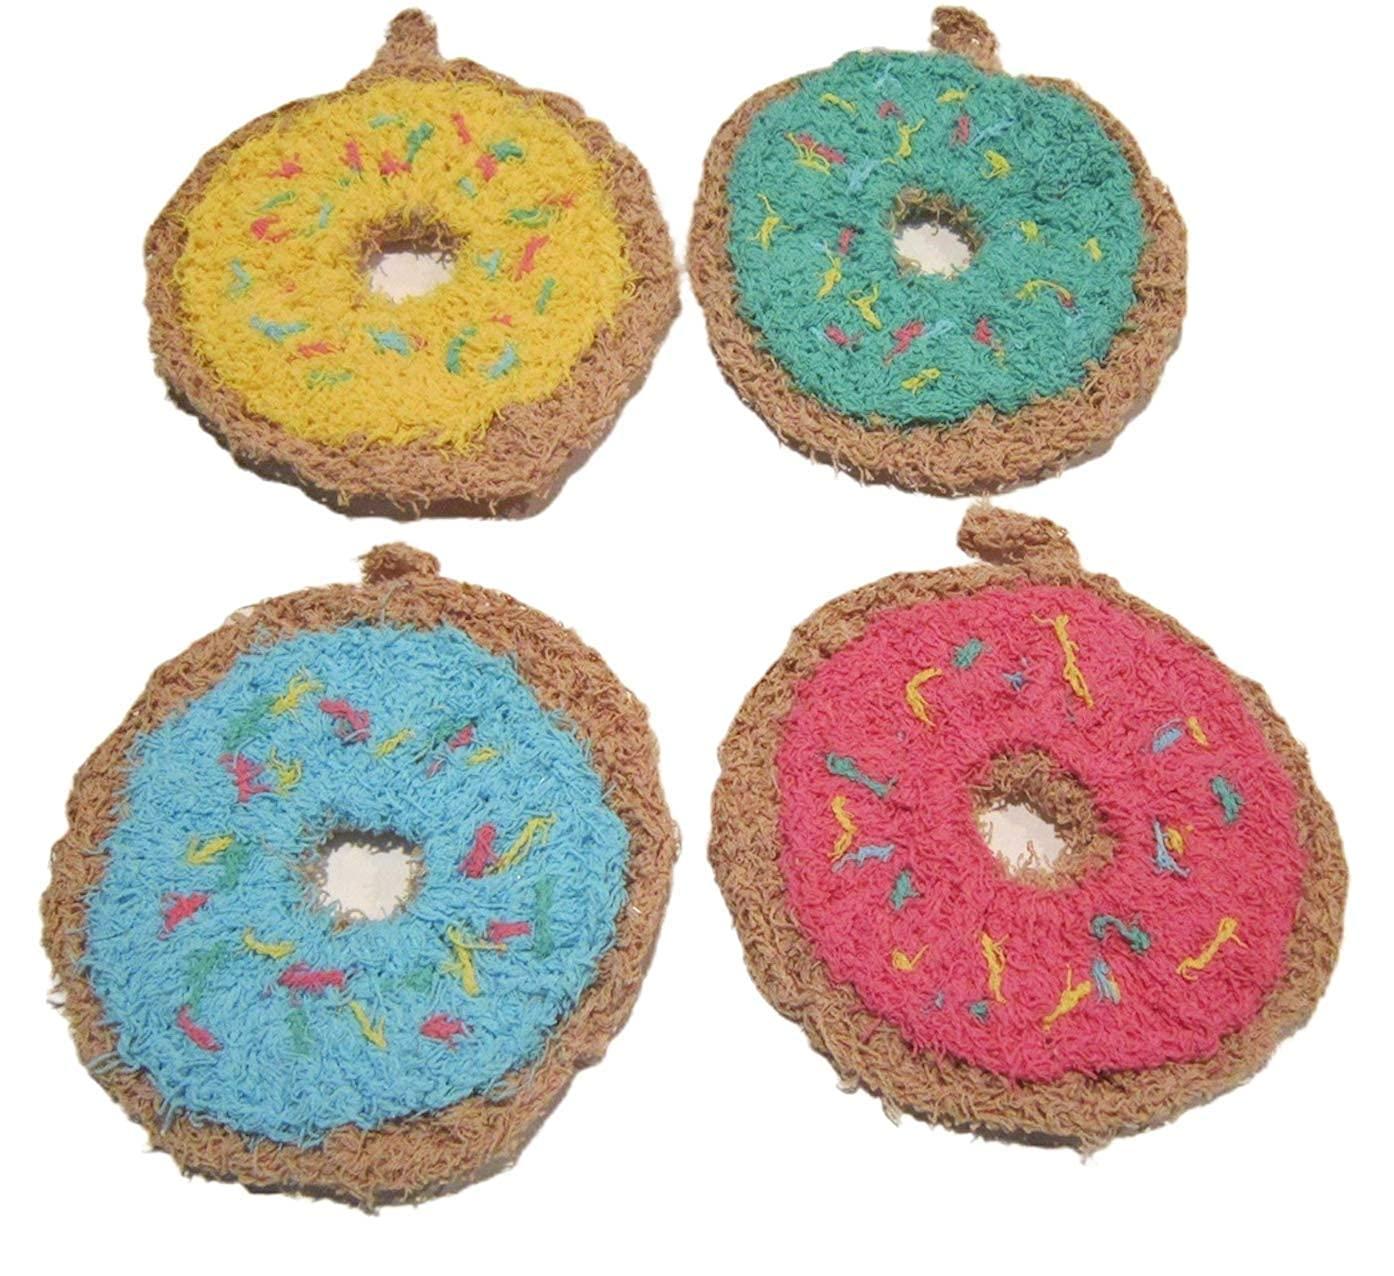 Donut Scrubby - Christmas Topics on TV OFFicial Halloween Sprinkles